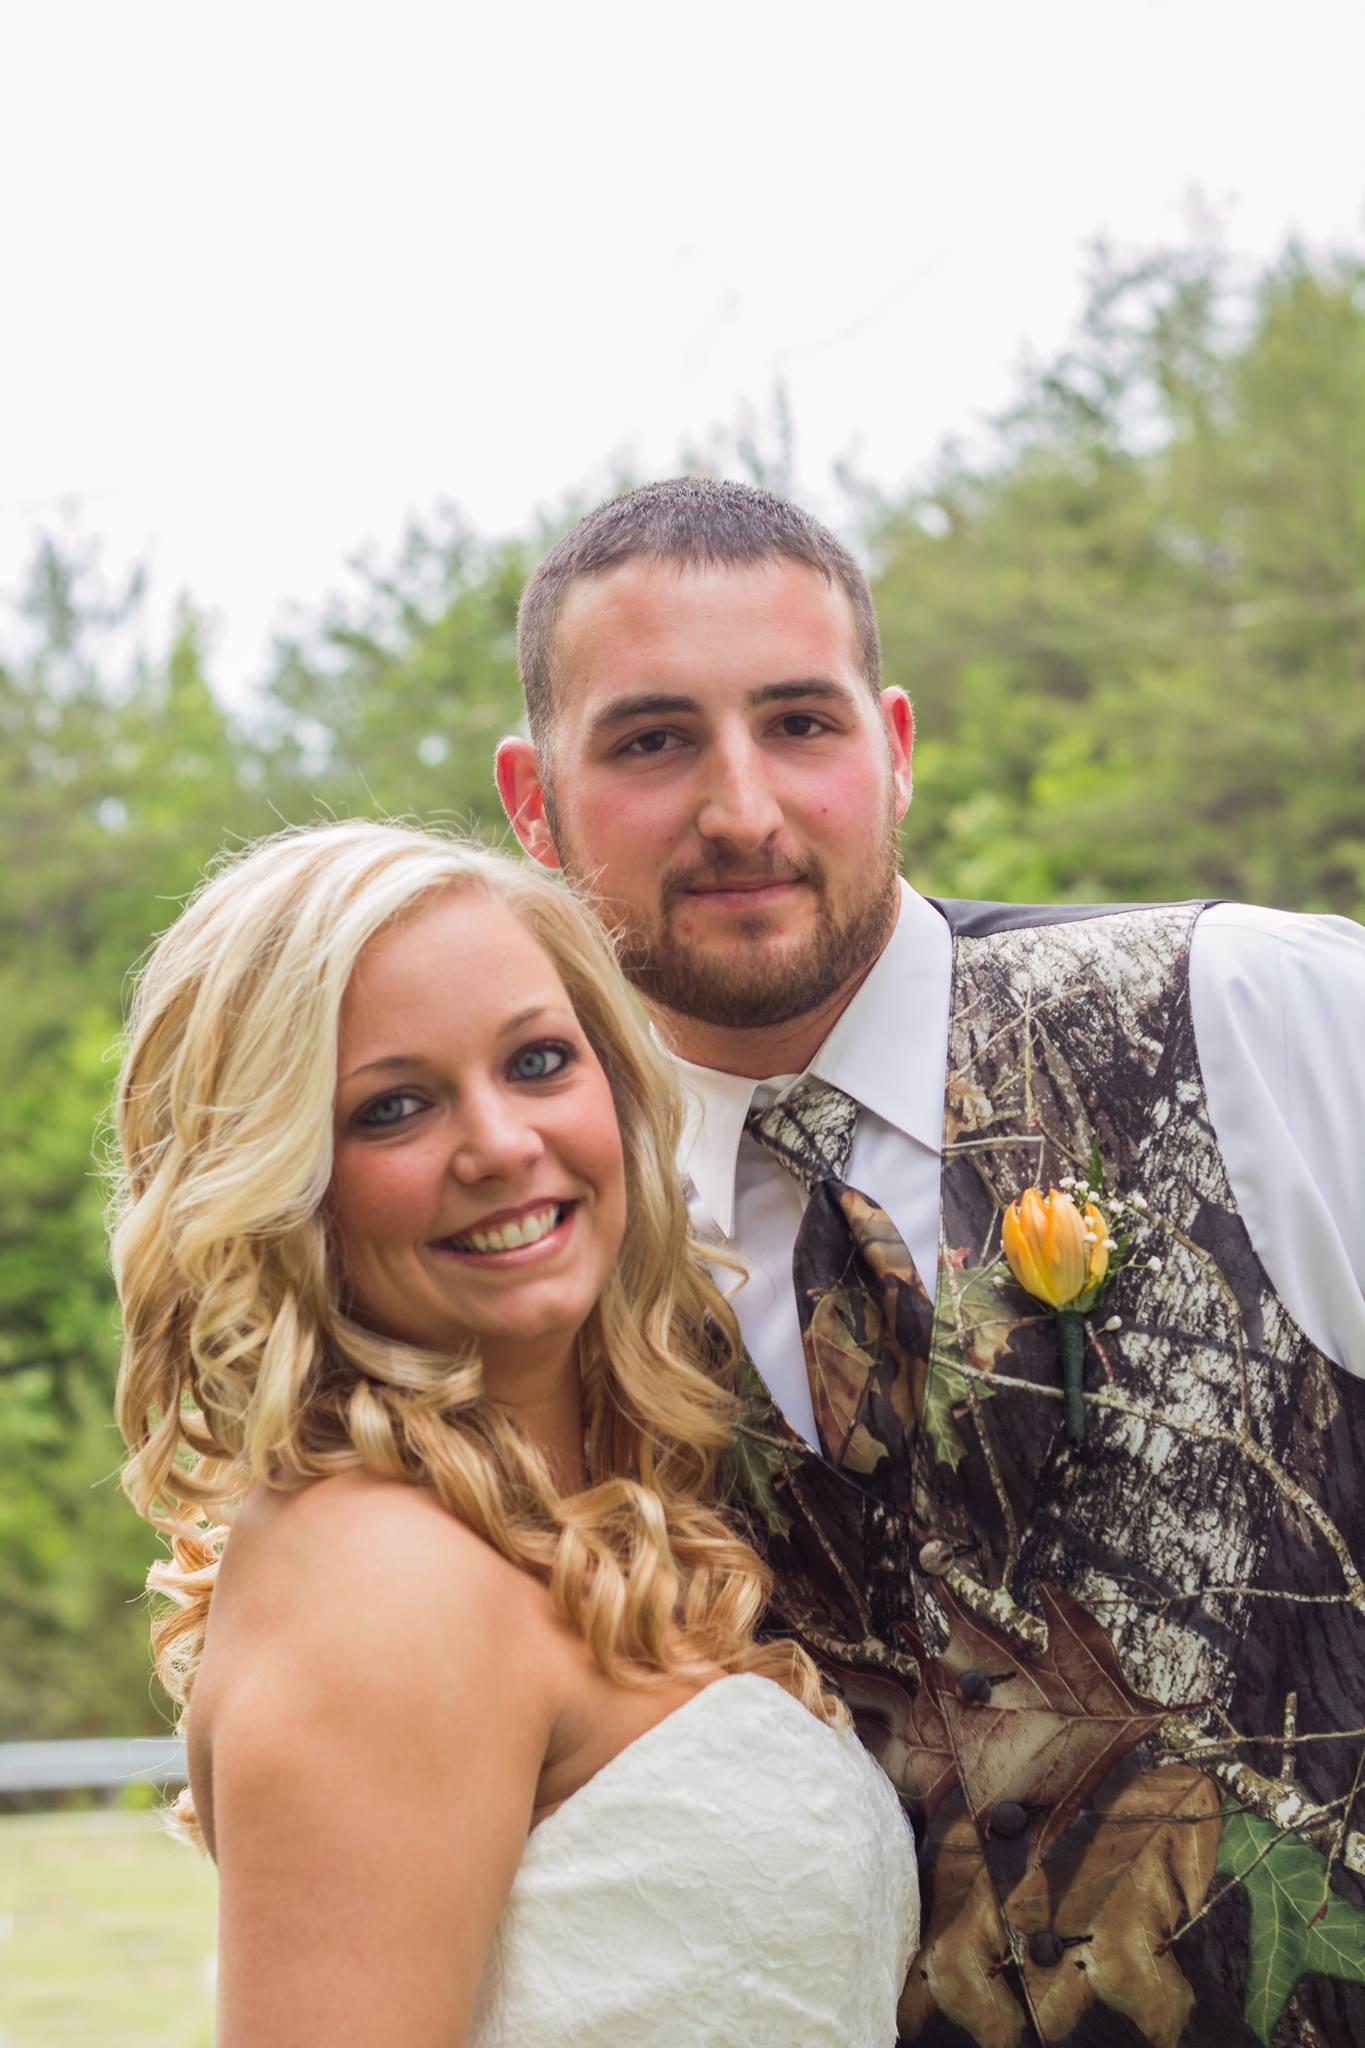 Lauren & Kaleb\'s Rustic Country and Camo Wedding - CAMOKIX